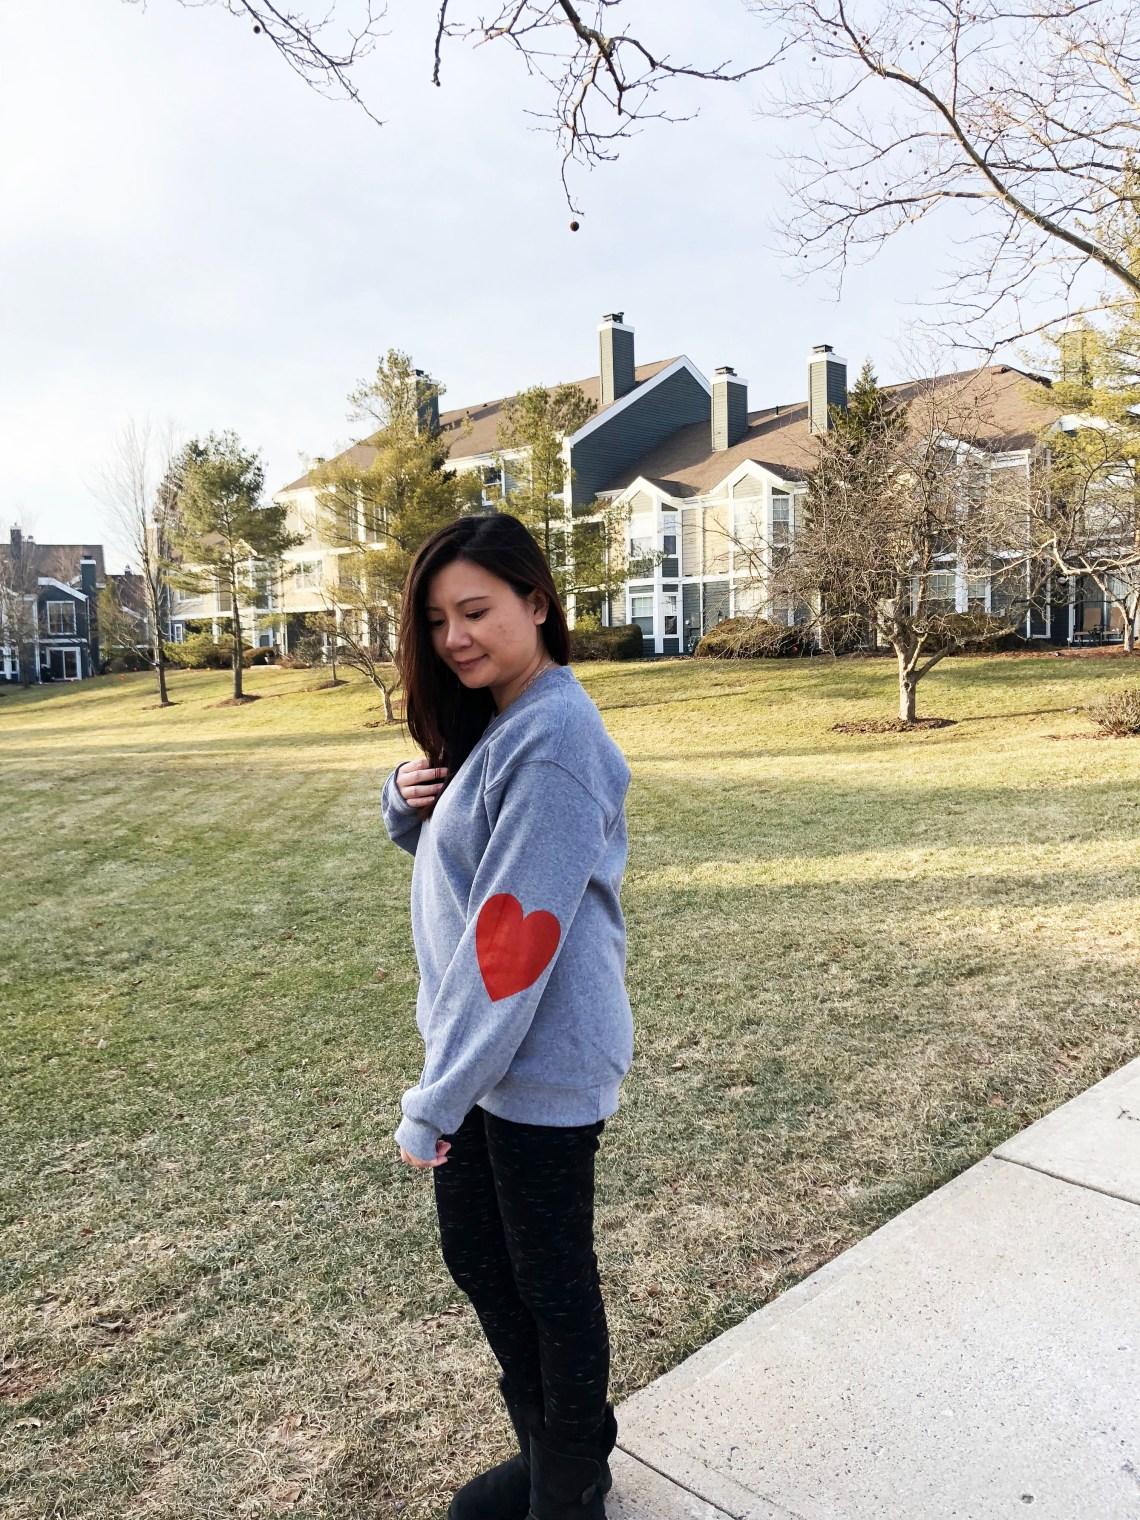 Elbow Heart Sweatshirt